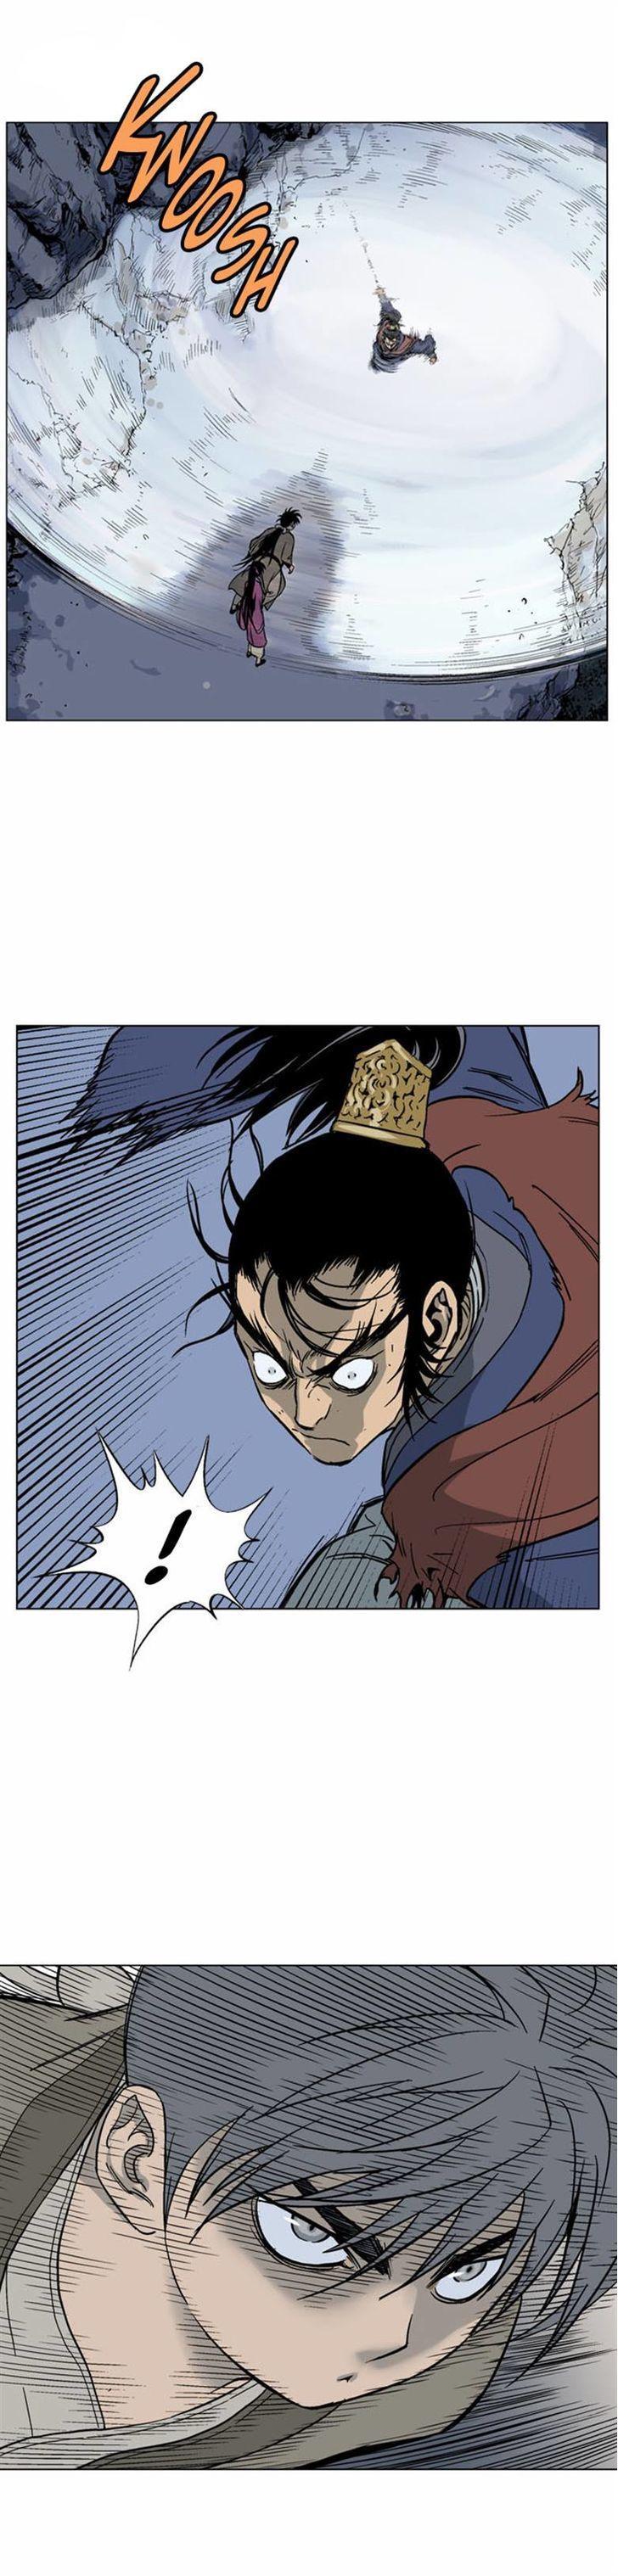 https://c5.ninemanga.com/es_manga/pic2/9/18249/518470/ff12592a08c792faa97fd3d2dc40f1cd.jpg Page 22